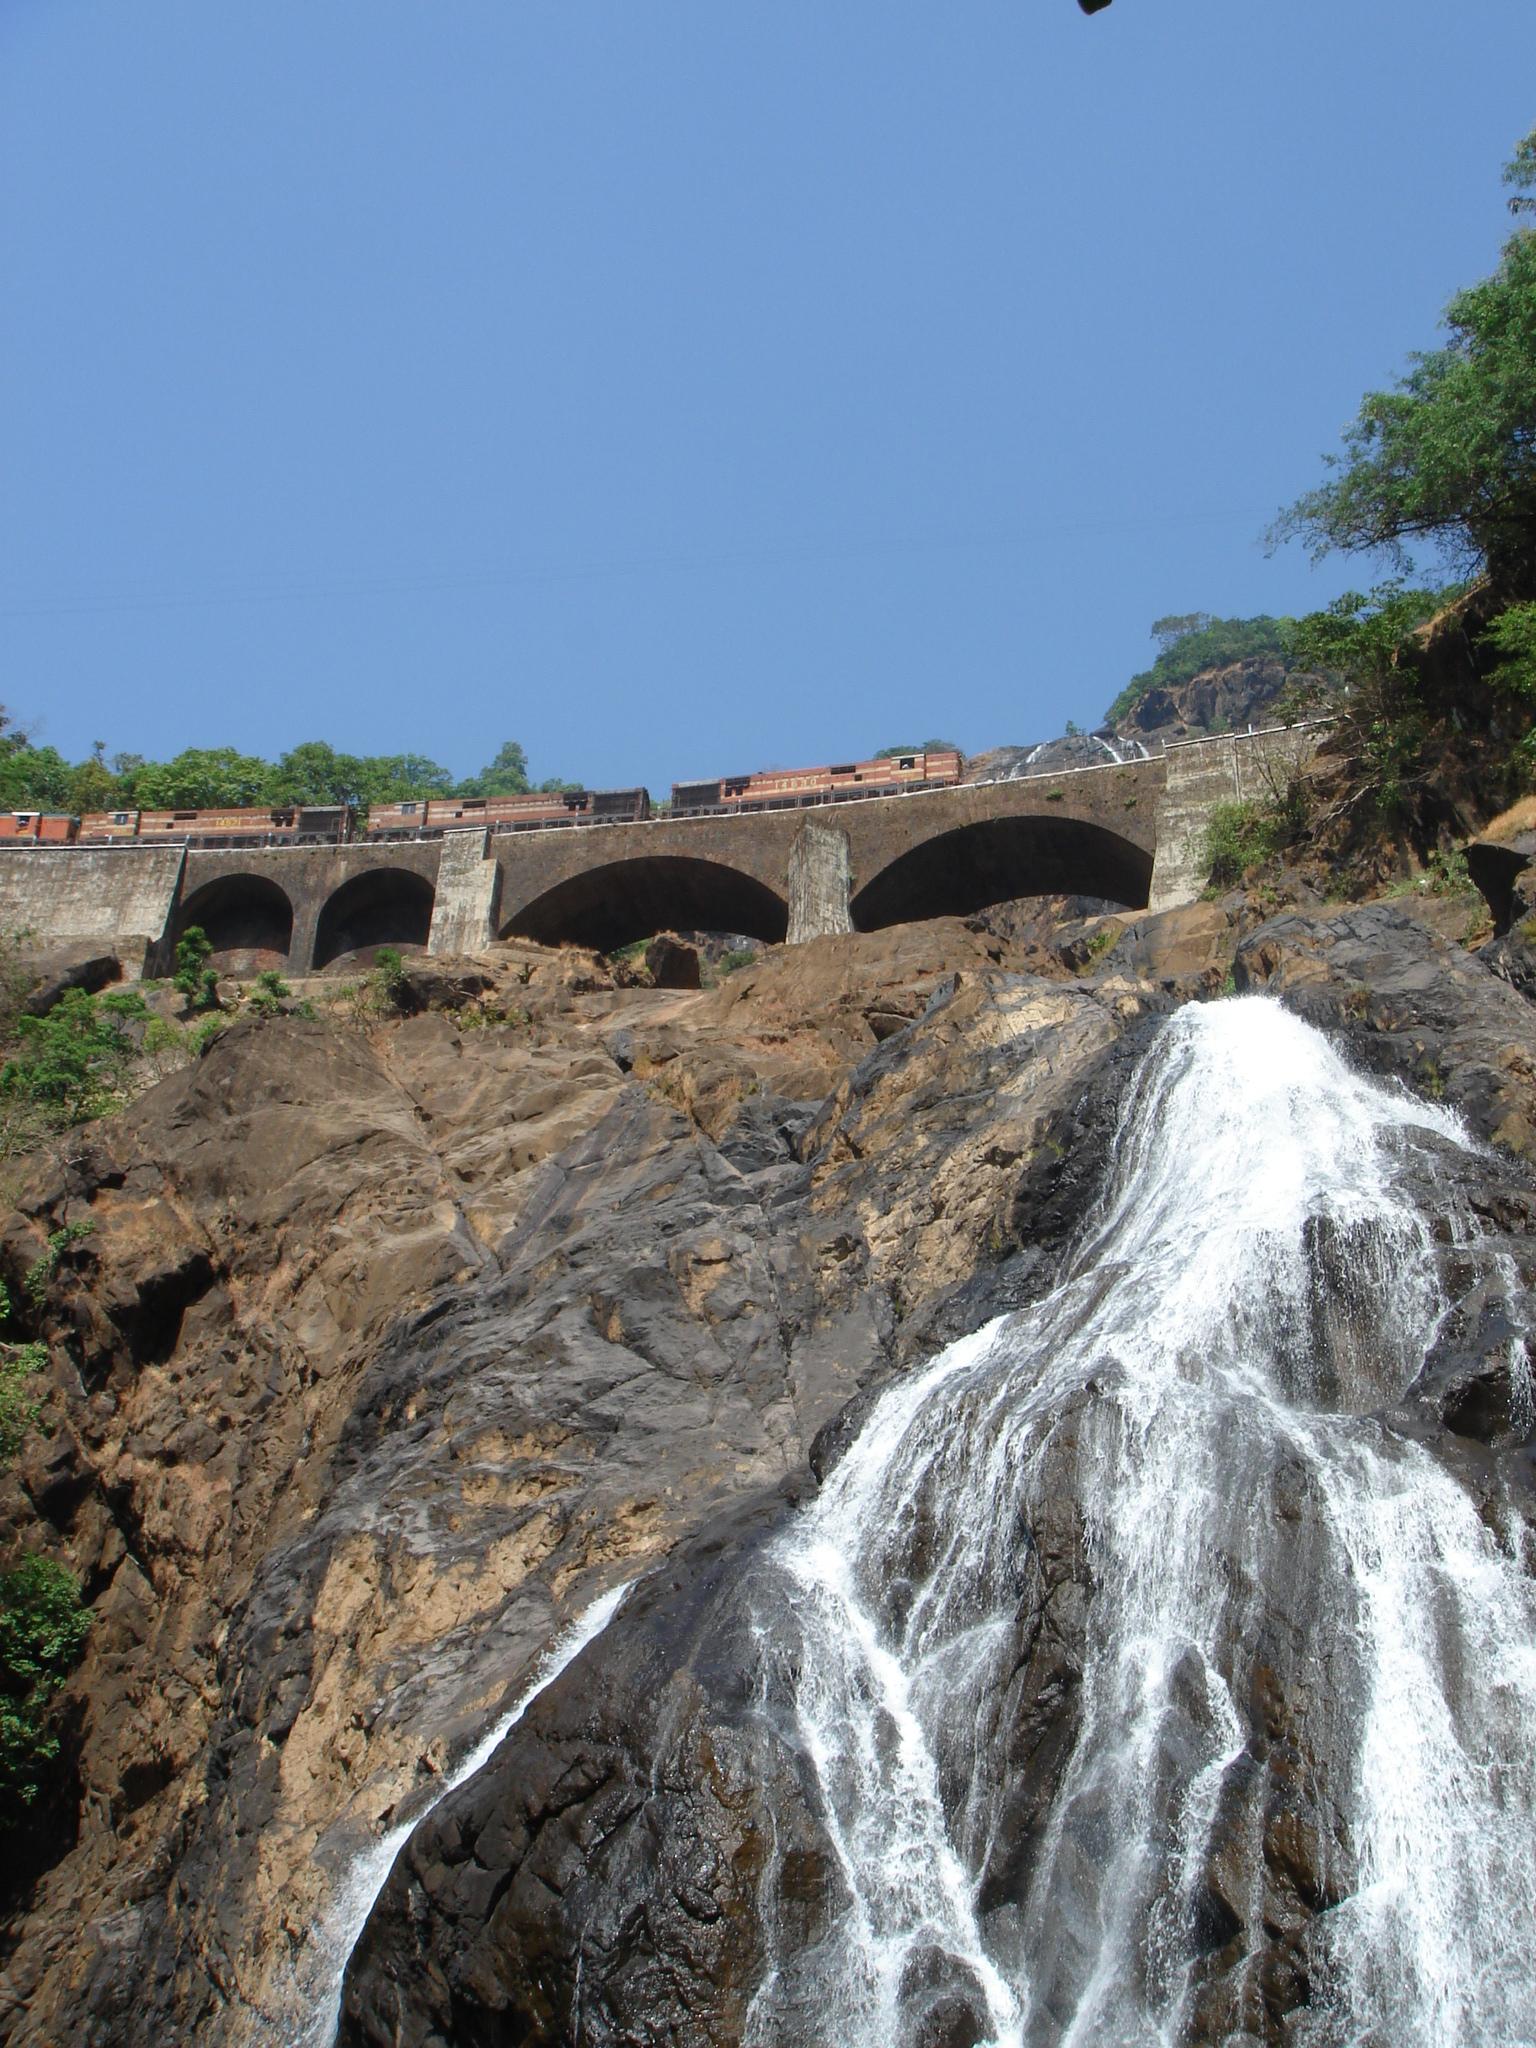 Lower half of the falls.